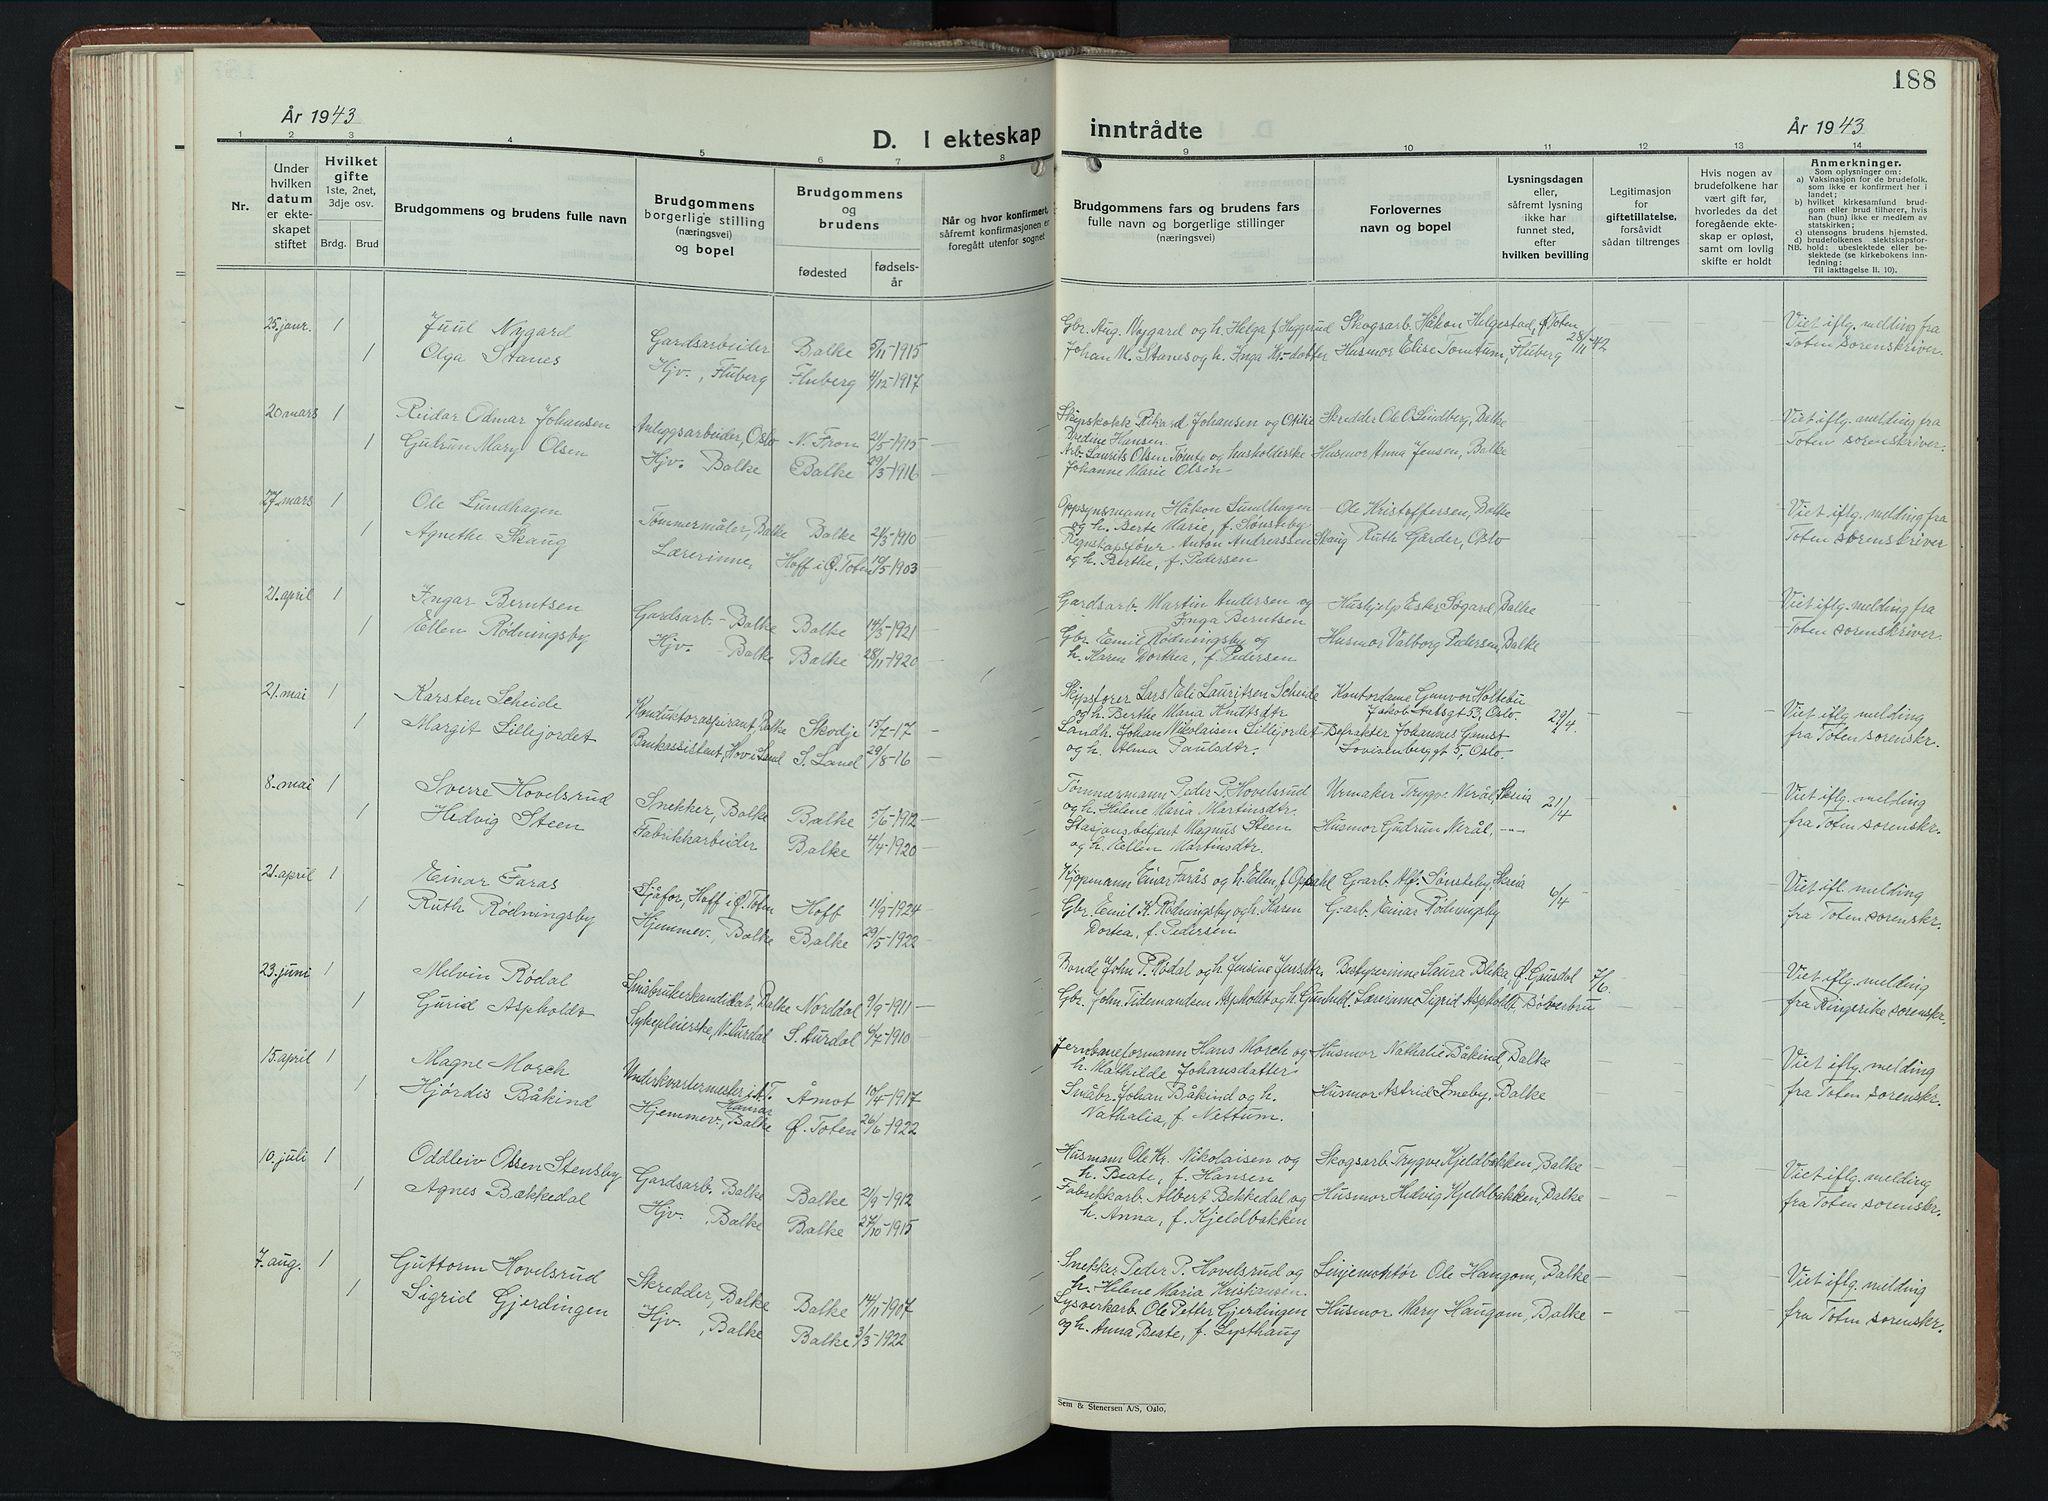 SAH, Balke prestekontor, Klokkerbok nr. 2, 1929-1951, s. 188